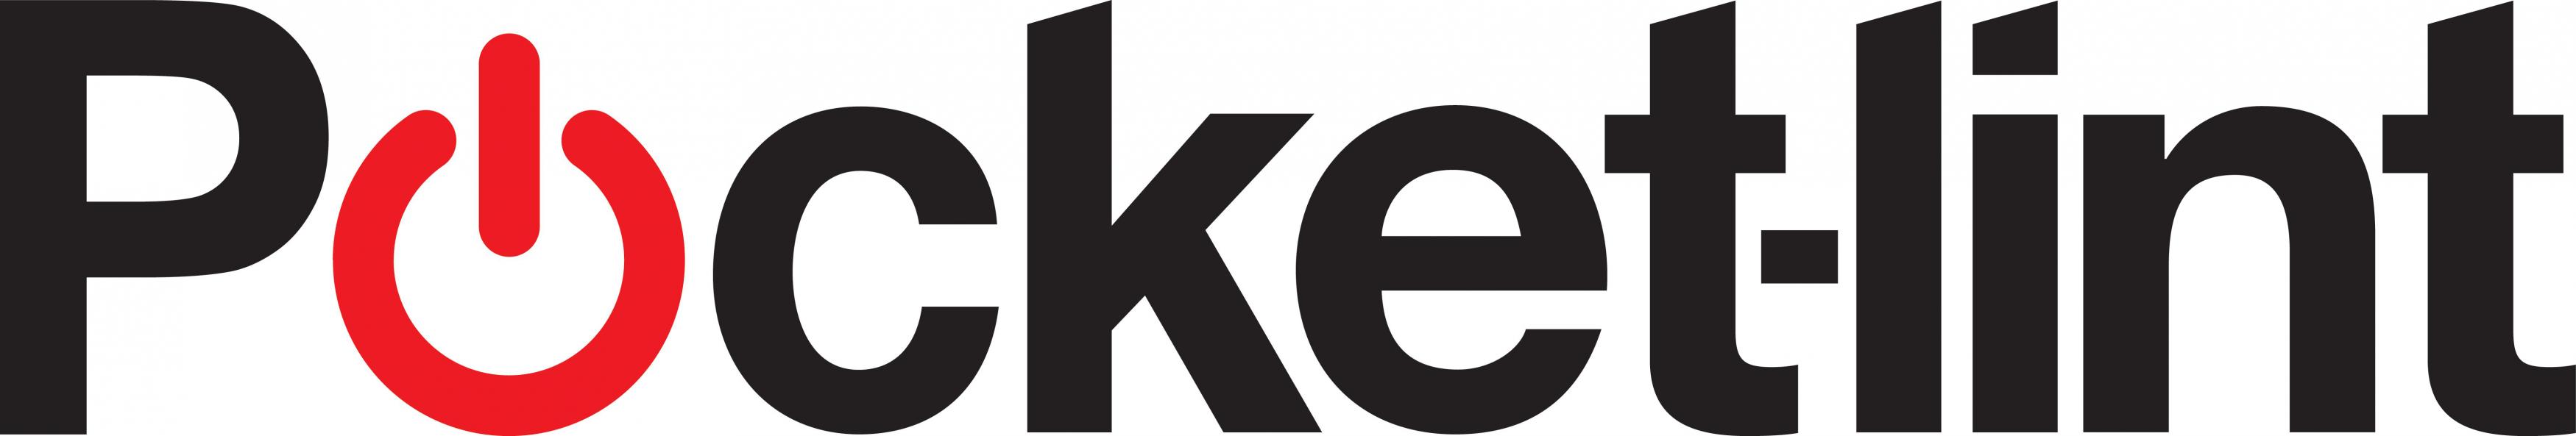 pocketlint logo